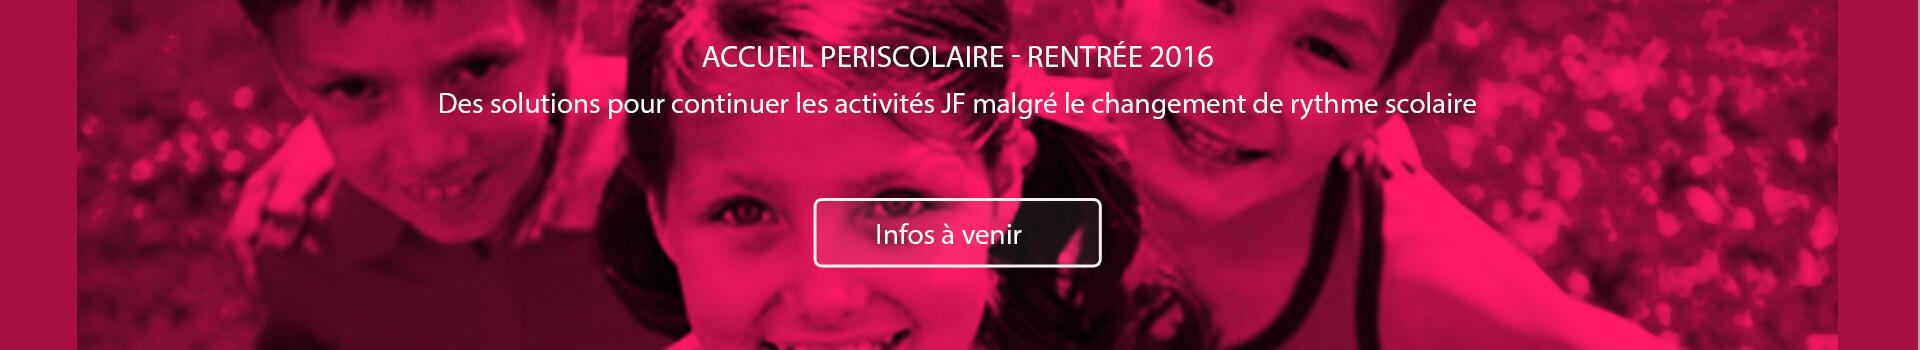 bandeau_actualites_JF_periscolaire